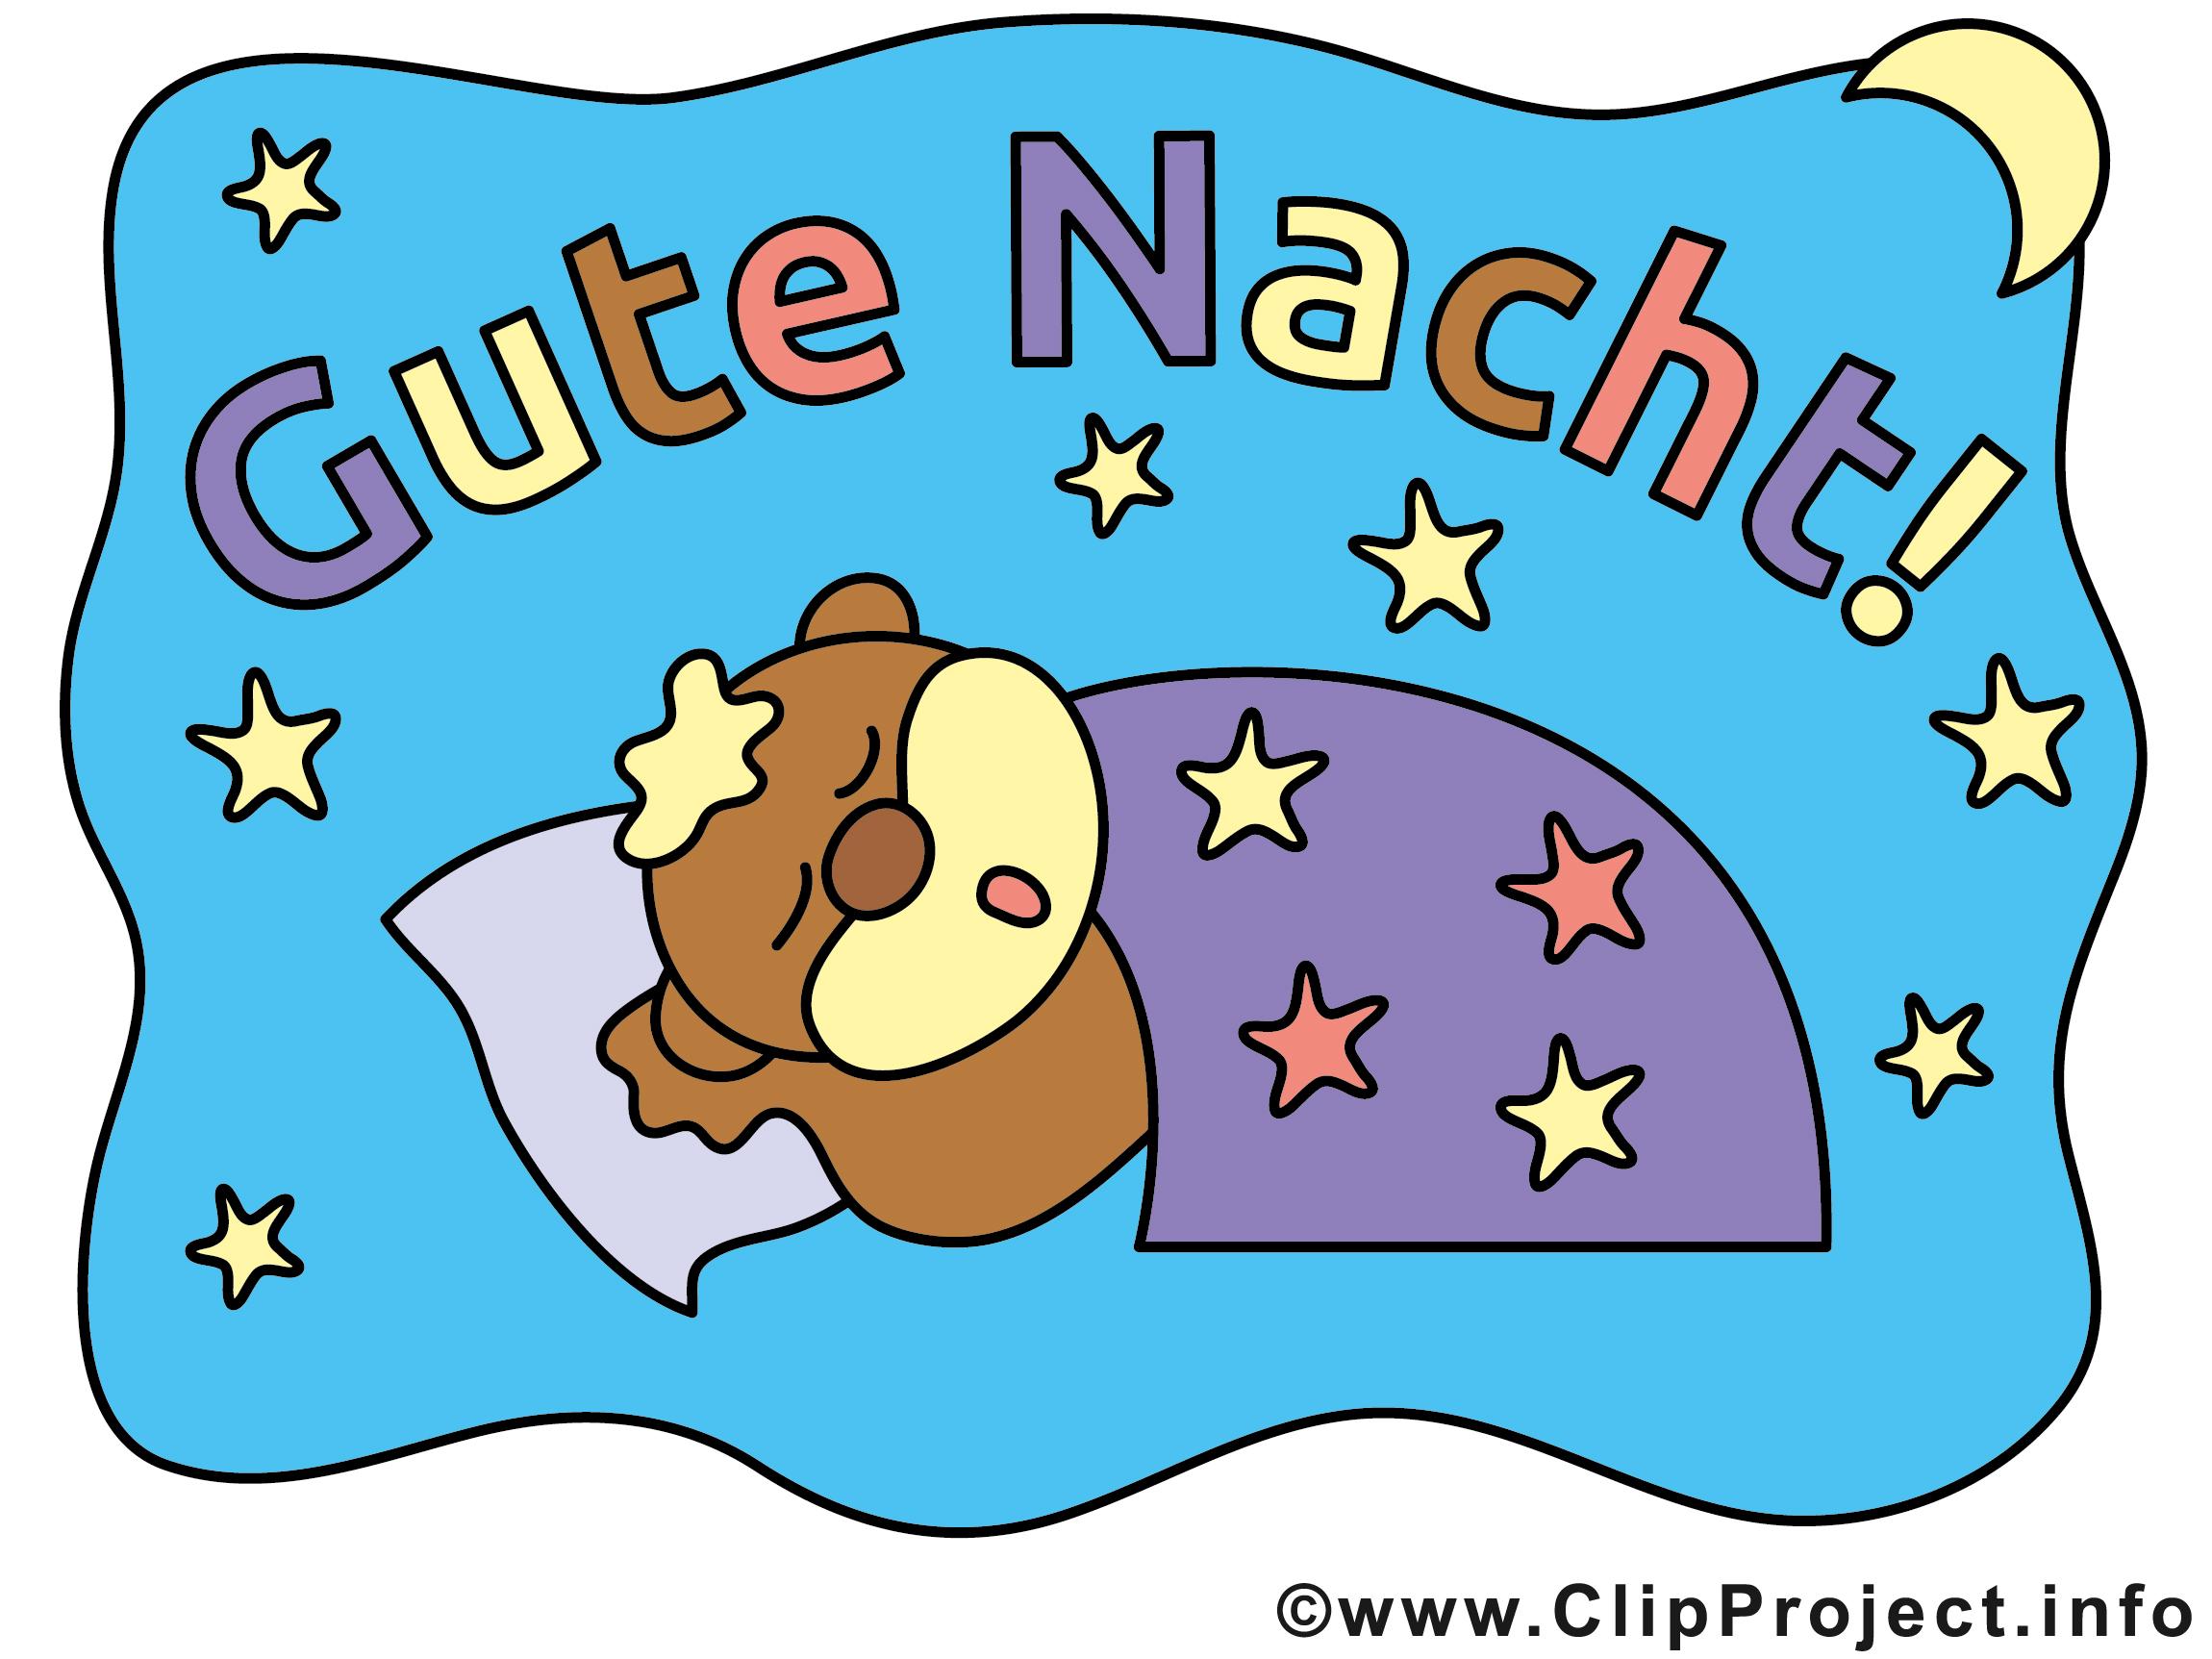 Clipart gute nacht picture black and white download Gute Nacht Bilder, Cliparts, Cartoons, Grafiken, Illustrationen ... picture black and white download